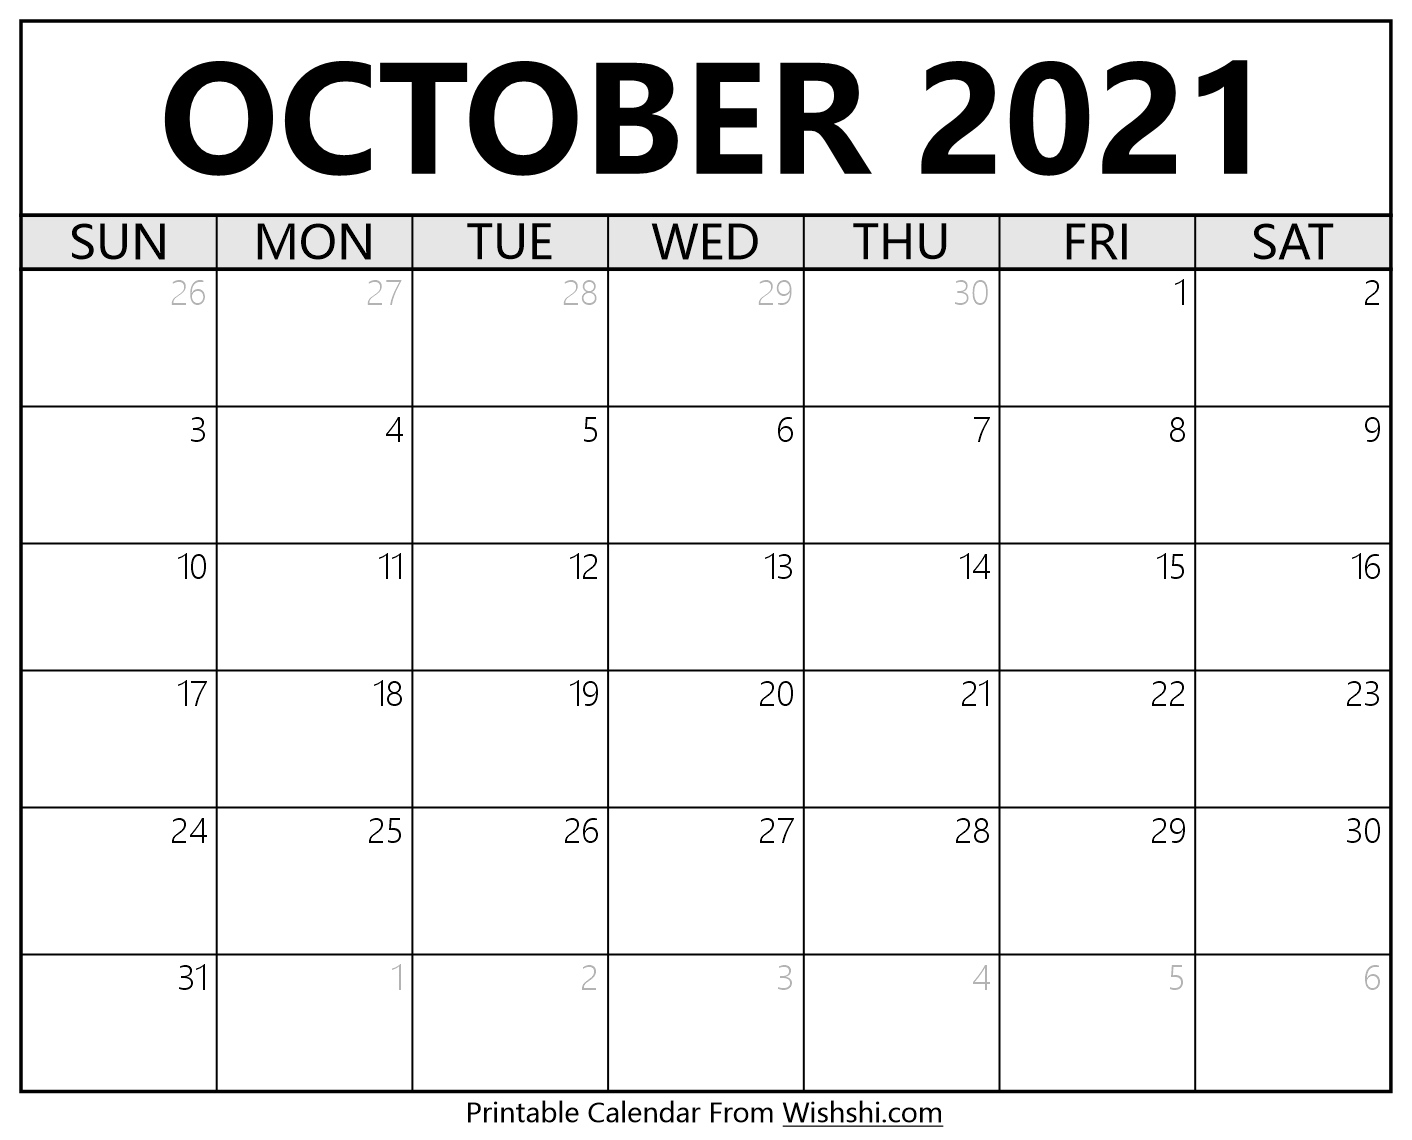 October 2021 Calendar Printable - Free Printable Calendars October 2021 Calendar Printable October 2021 Calendar To Print